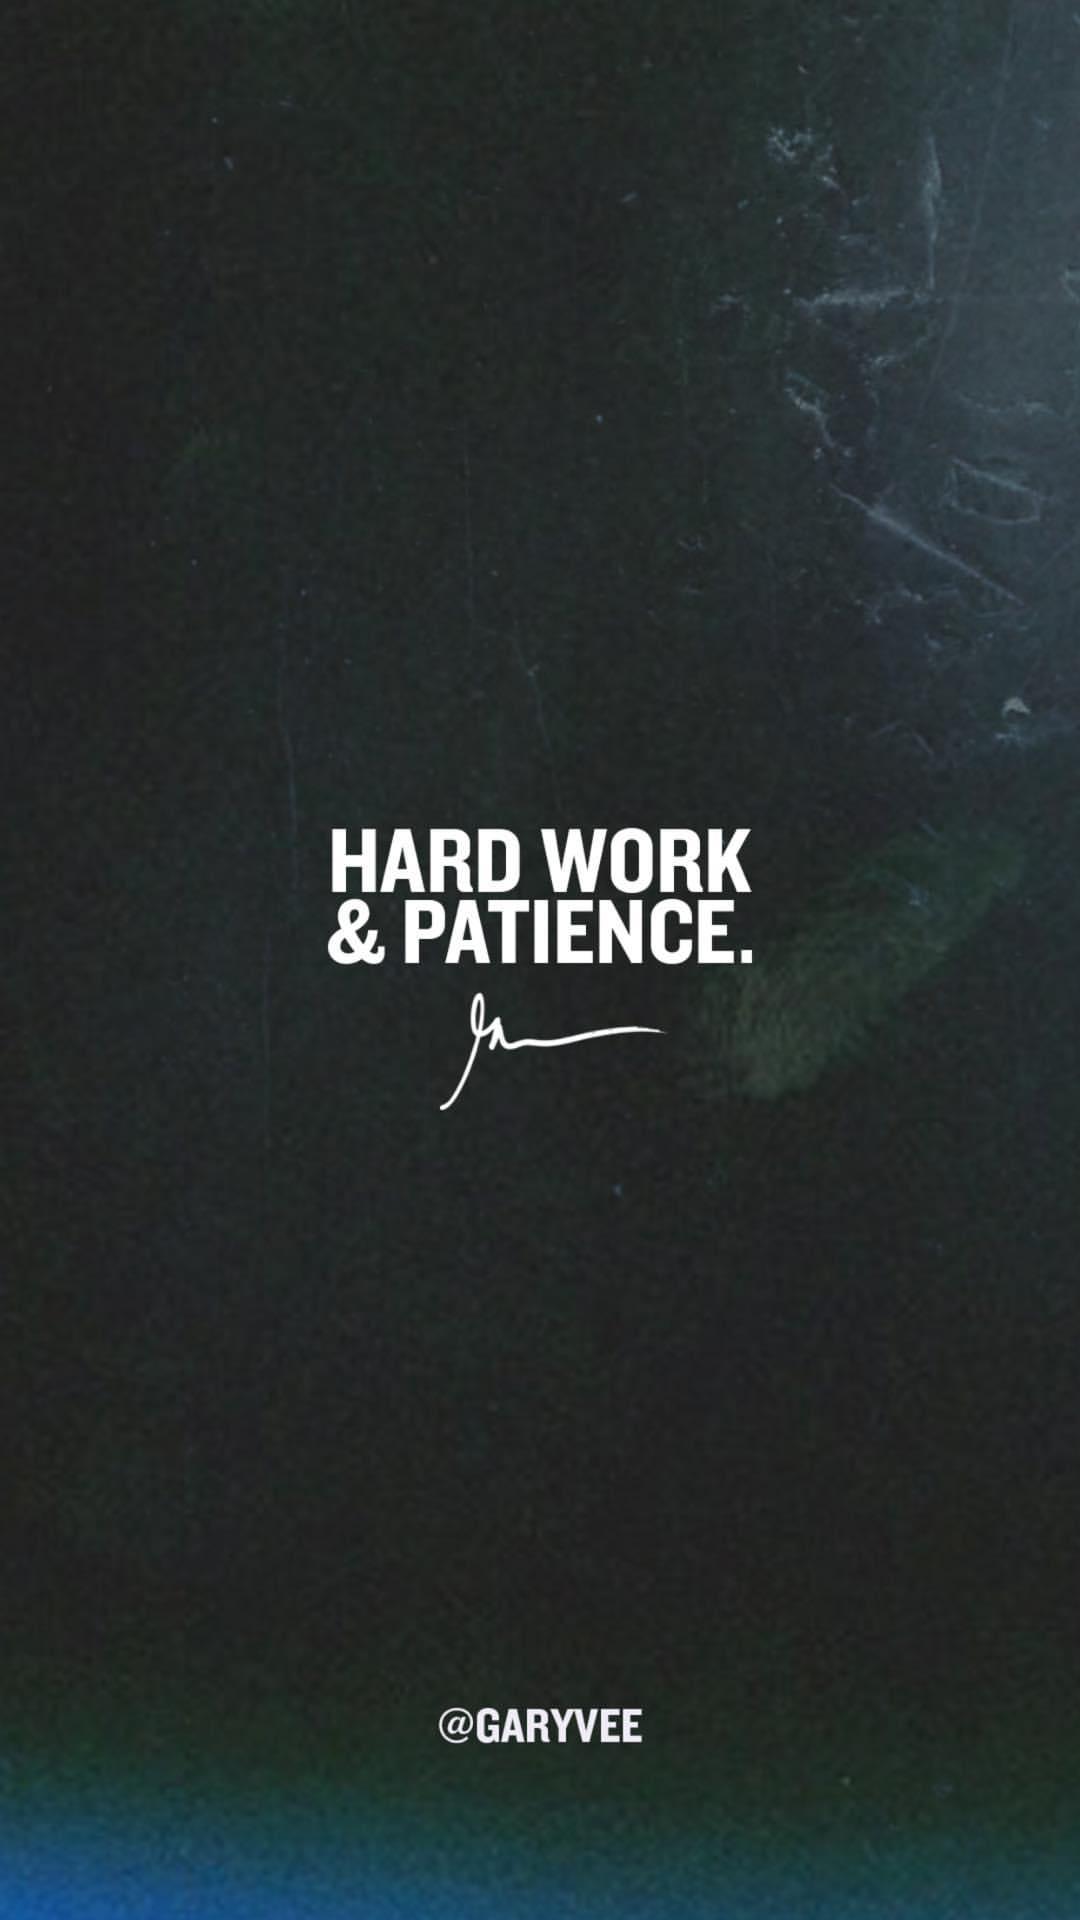 Hard Work Quotes Wallpapers Hd Gary Vaynerchuk Wallpapers